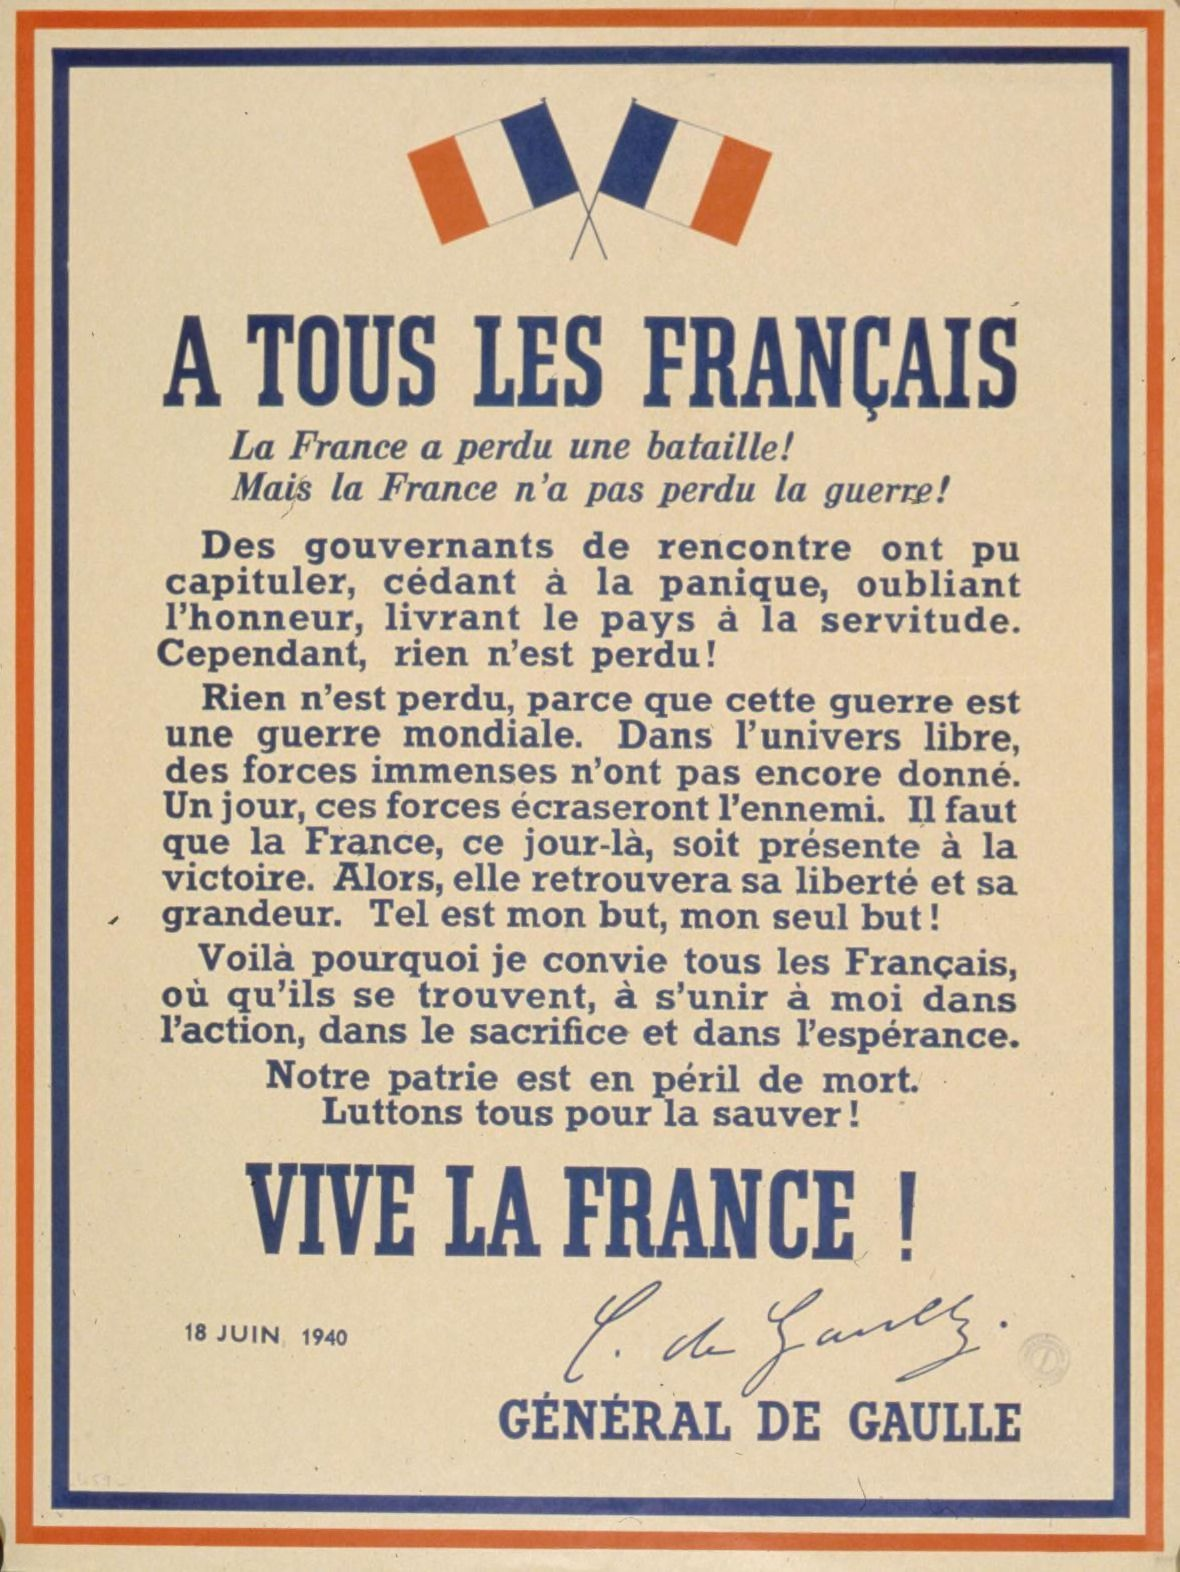 http://upload.wikimedia.org/wikipedia/commons/d/da/De_Gaulle_-_%C3%A0_tous_les_Fran%C3%A7ais.jpg